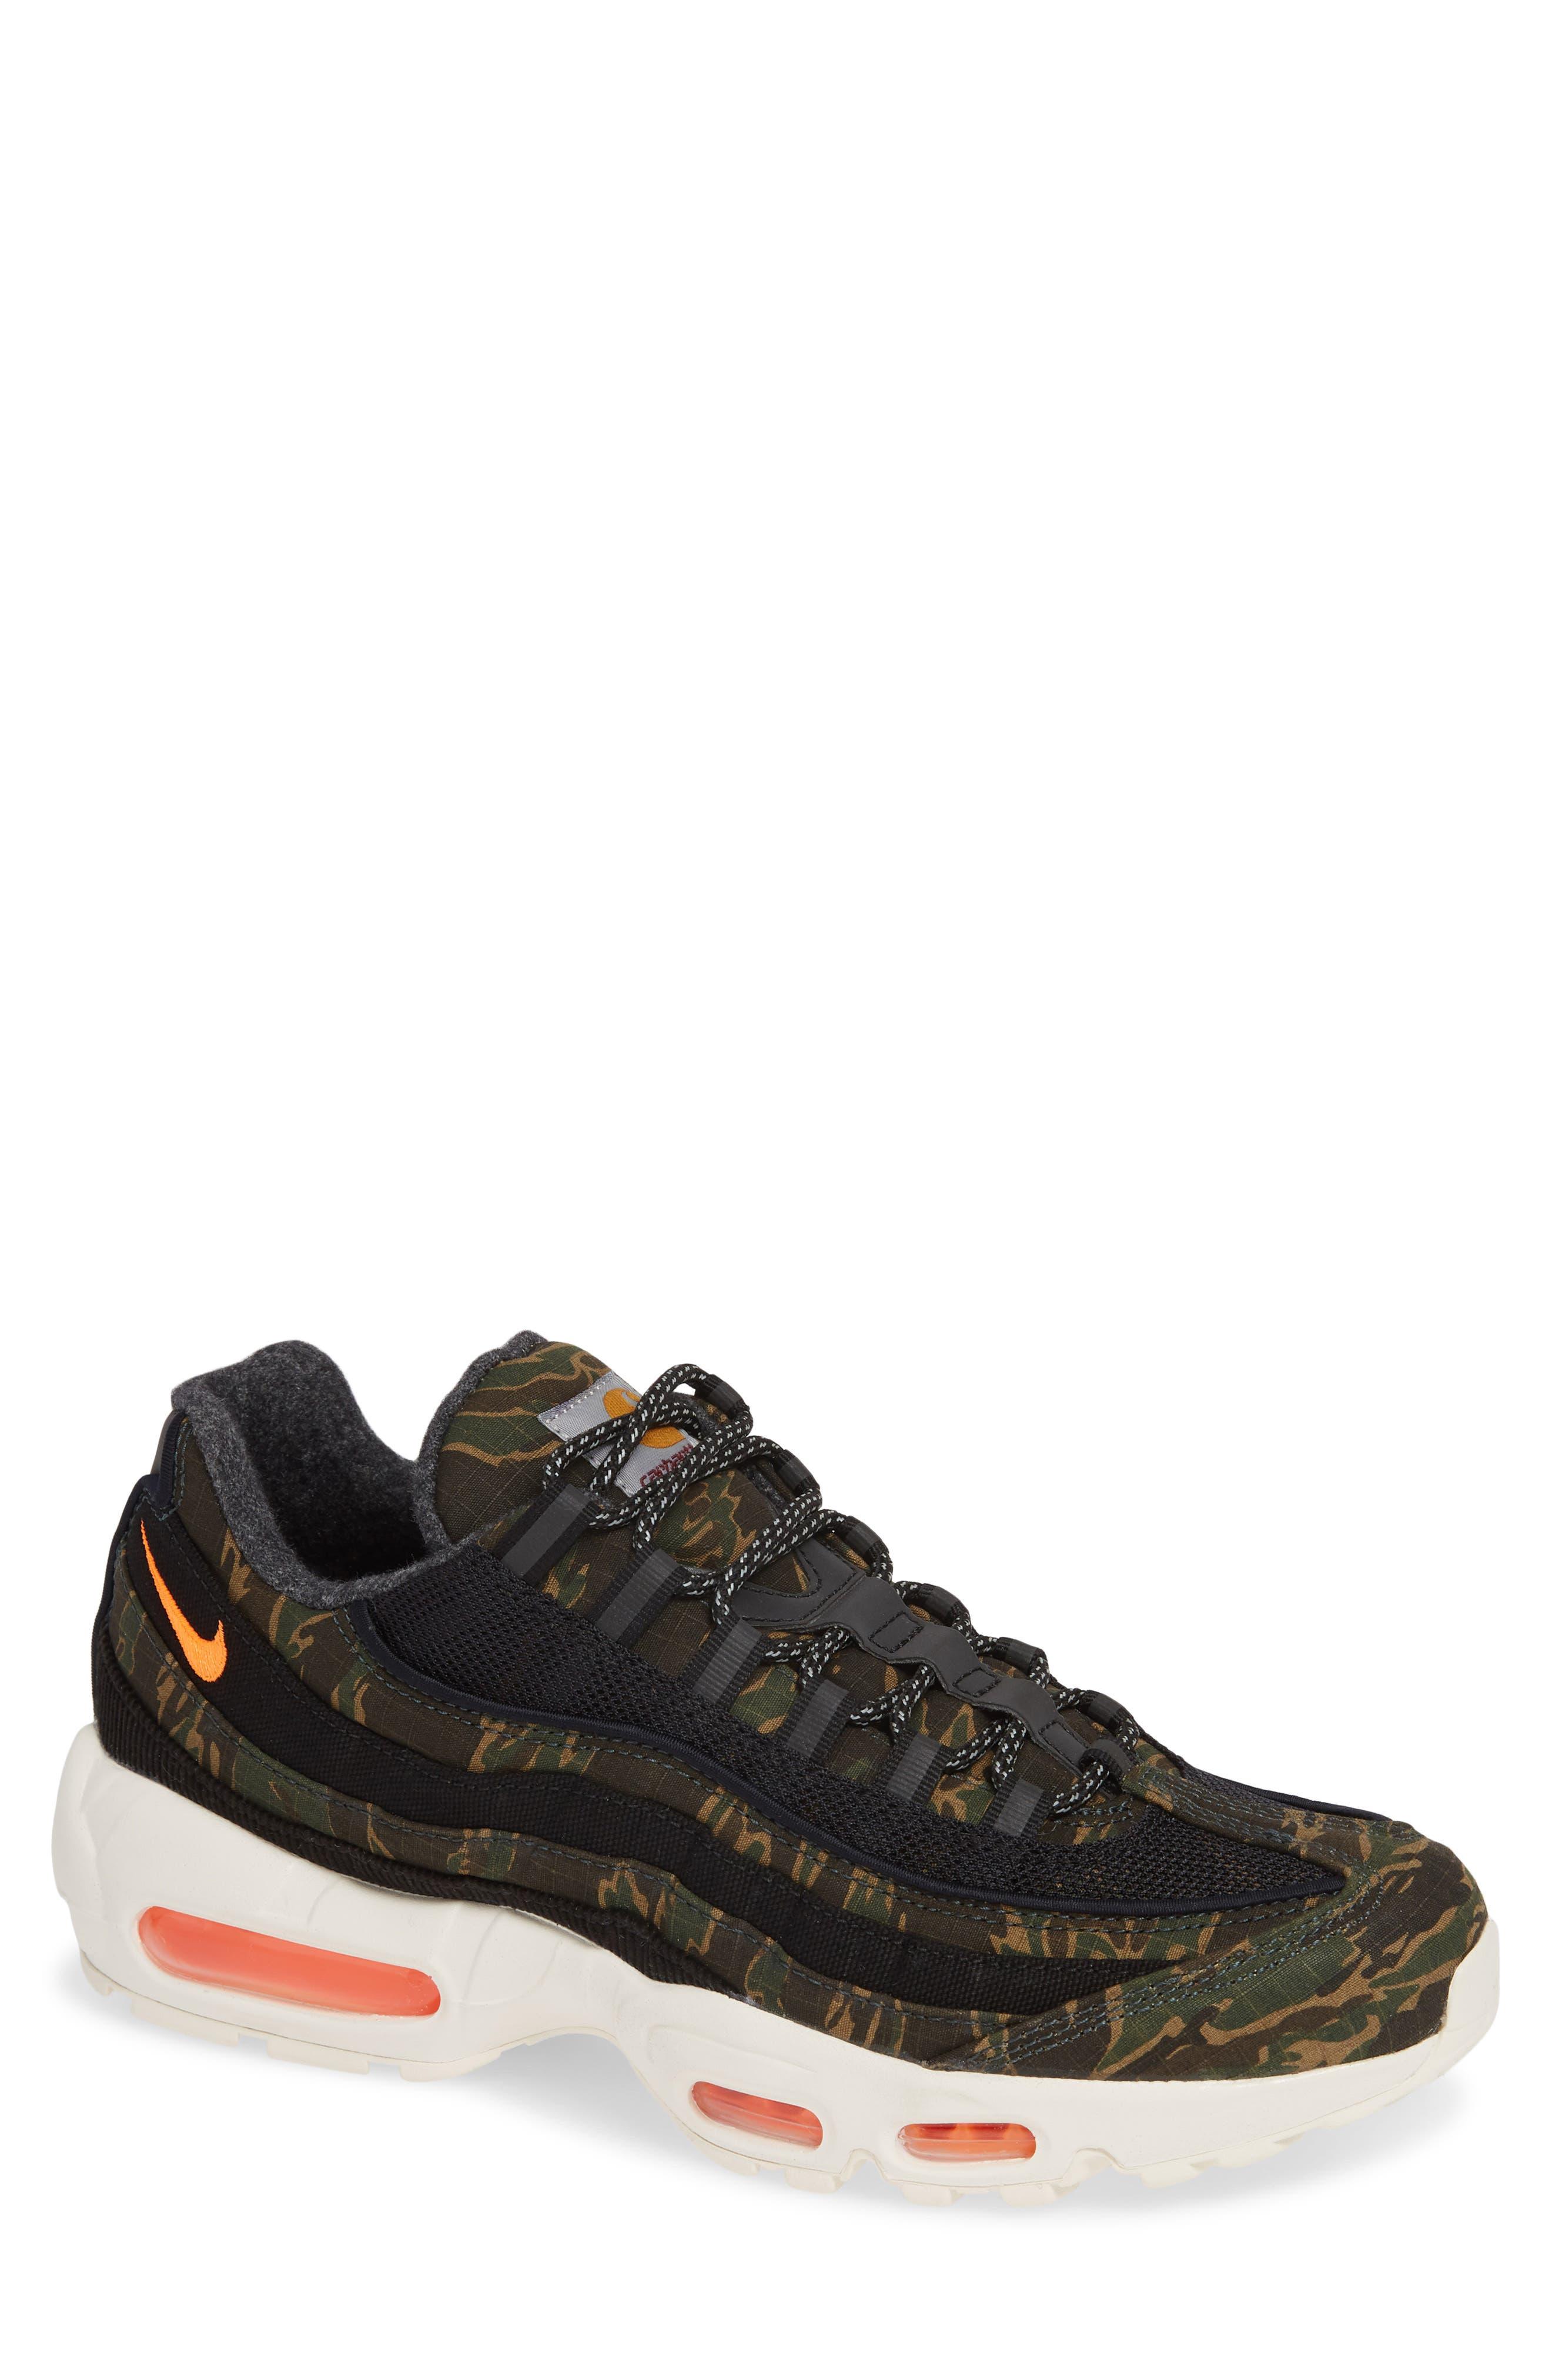 NIKE,                             x Carhartt Air Max 95 WIP Sneaker,                             Main thumbnail 1, color,                             001